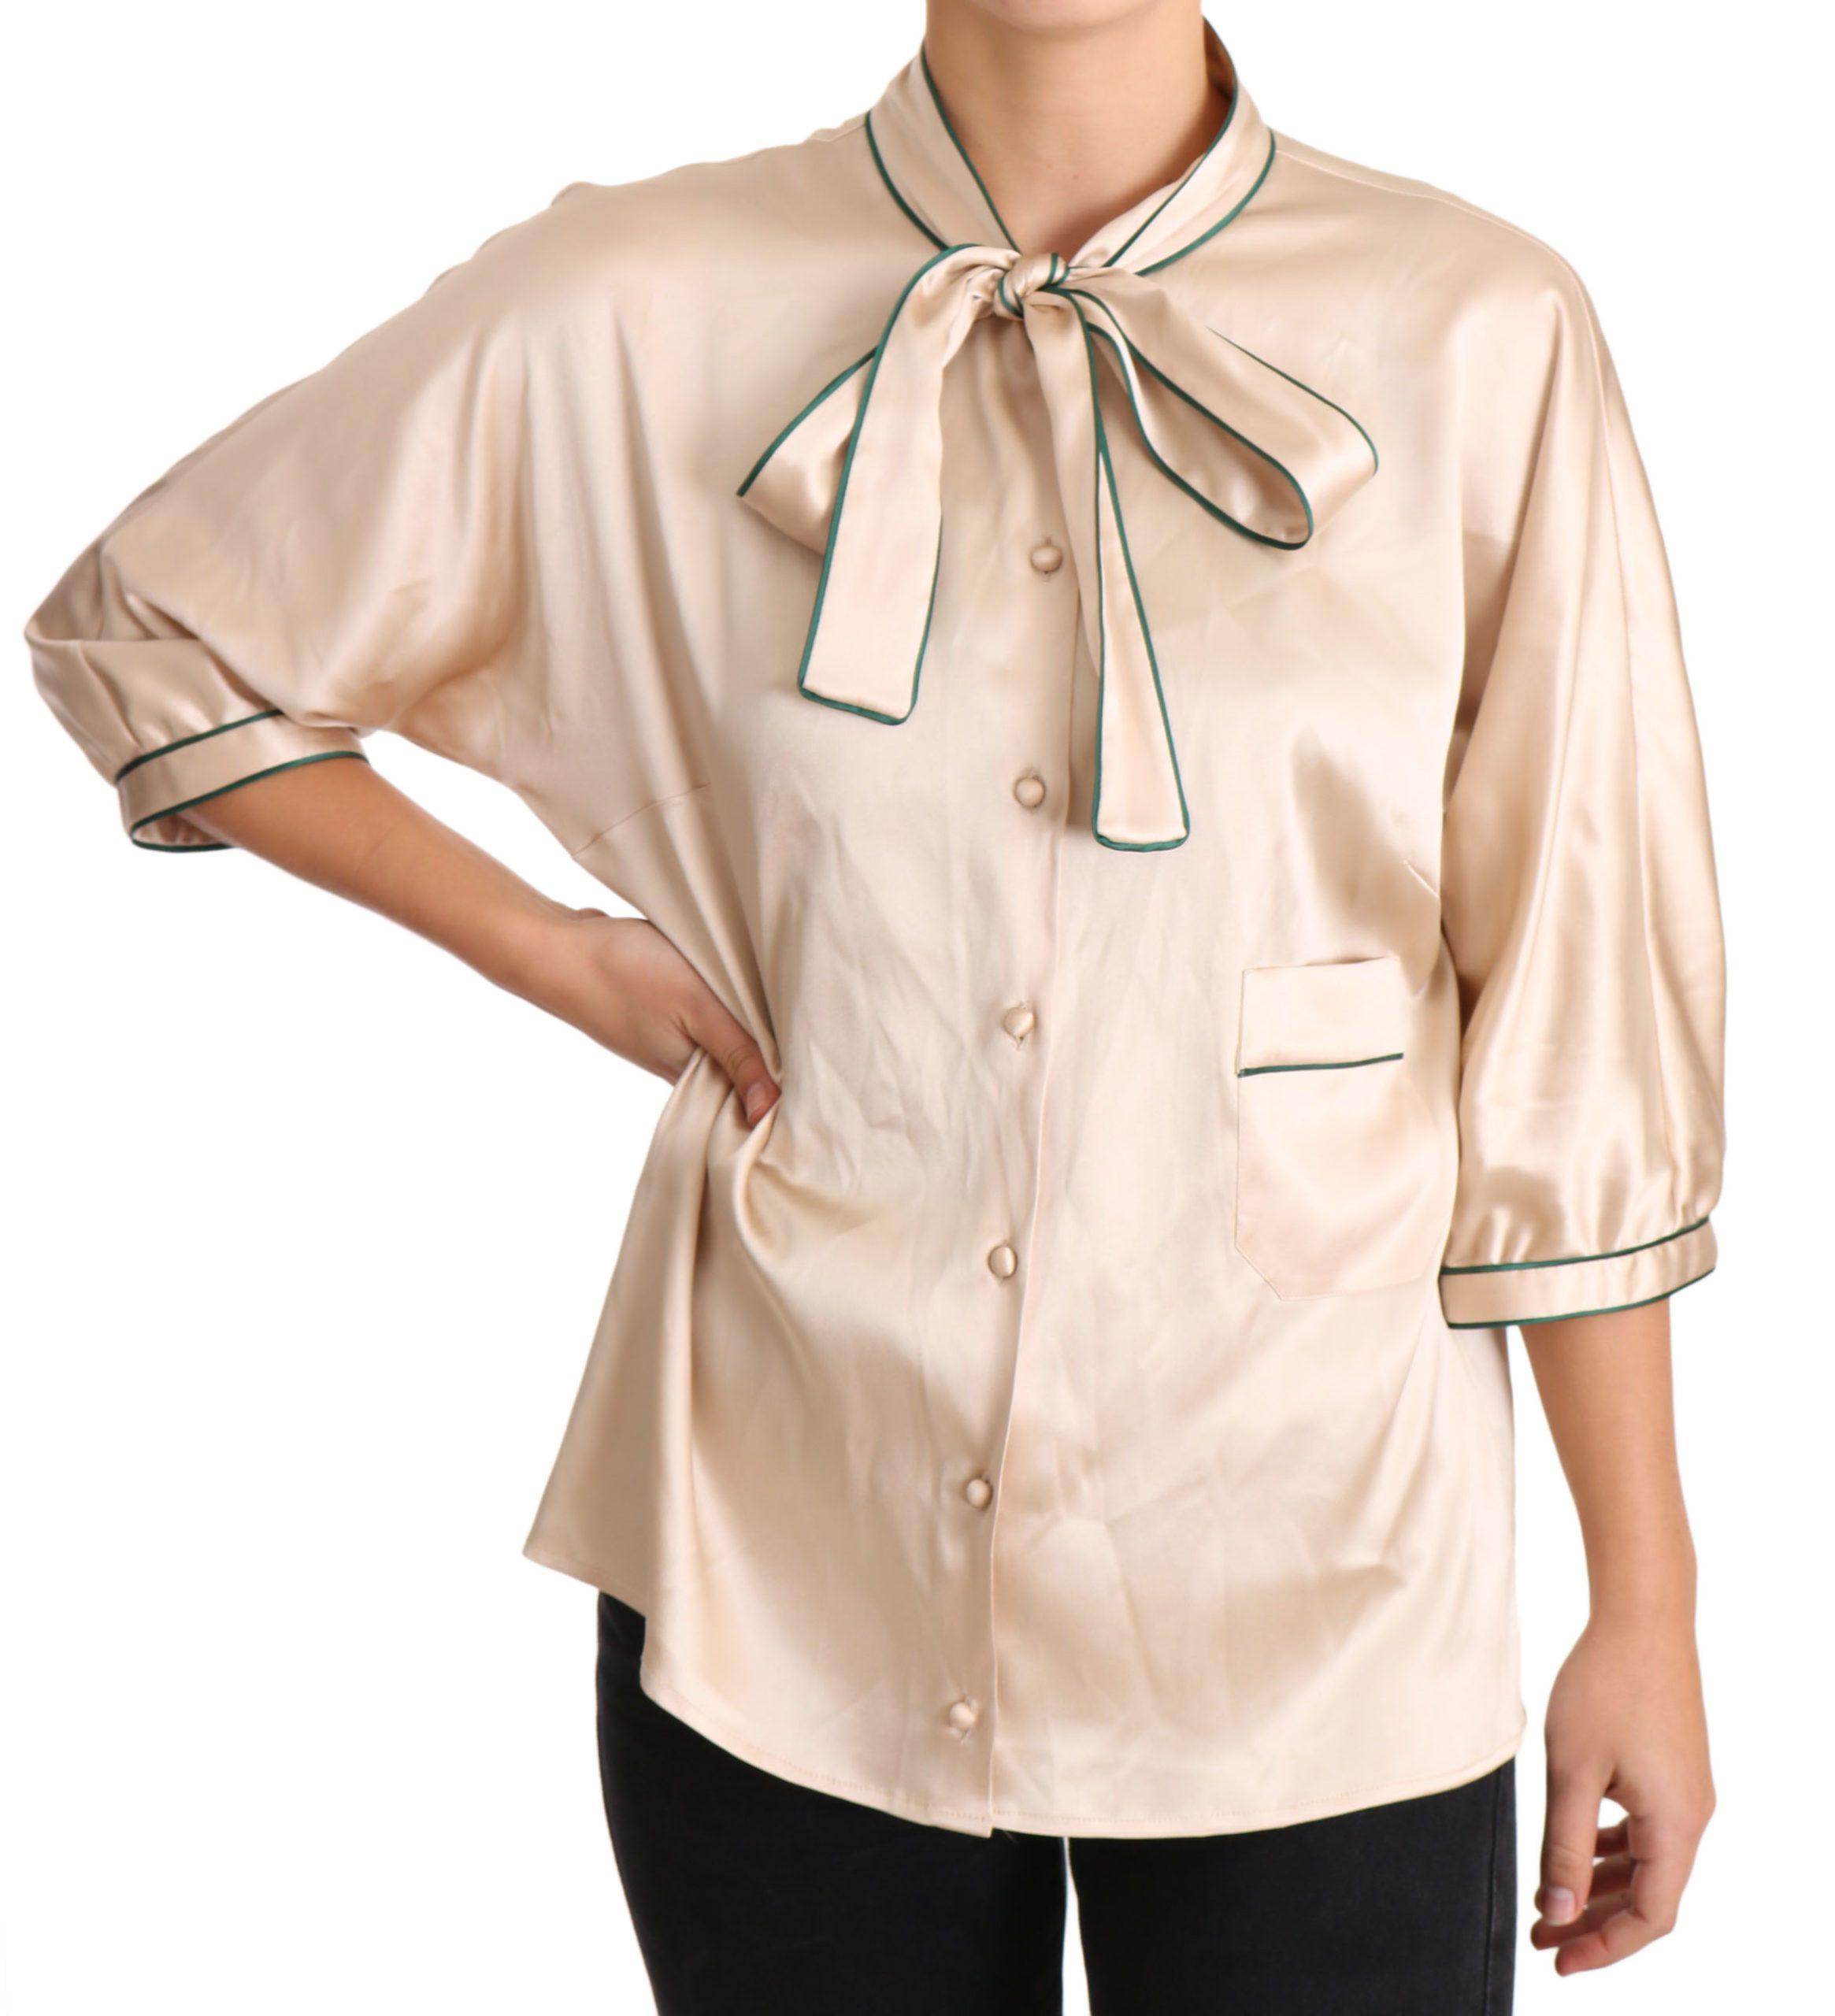 Dolce & Gabbana Women's Ribbon Silk Stretch Top Beige TSH3372 - IT48|XXL